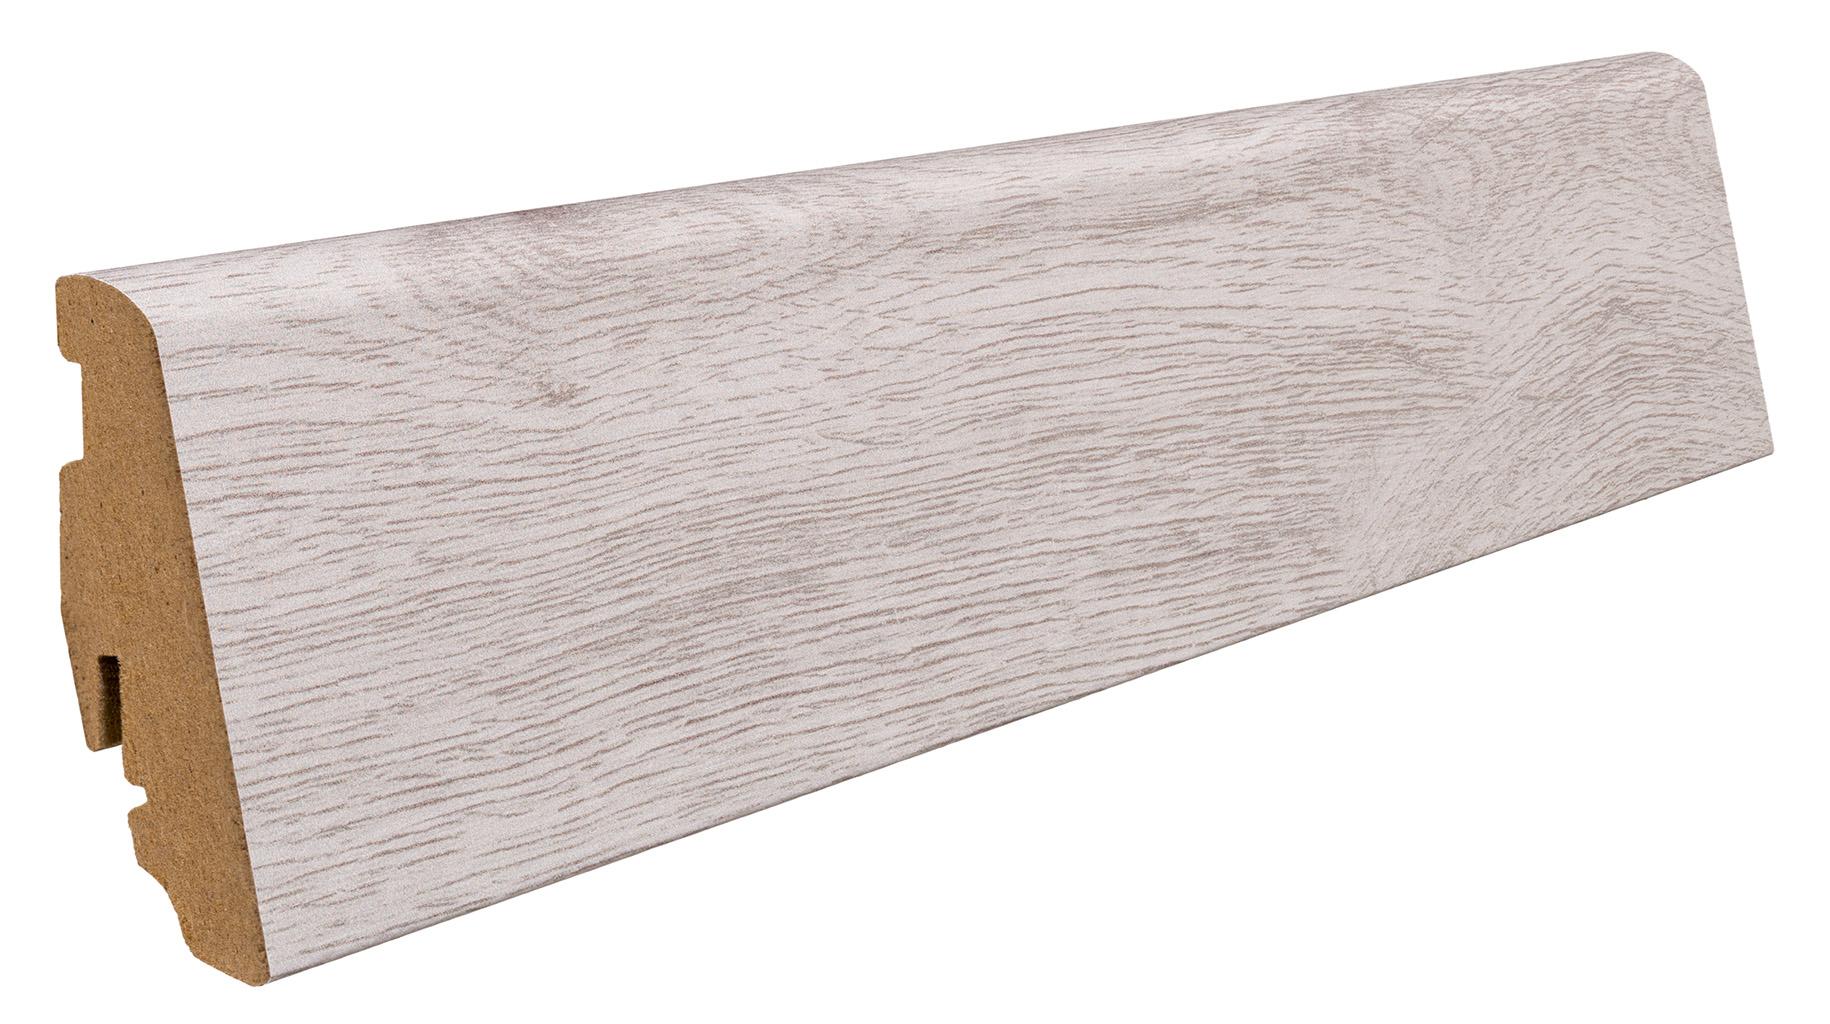 533199 haro disano classic eiche glacier treppenabschlussleiste. Black Bedroom Furniture Sets. Home Design Ideas